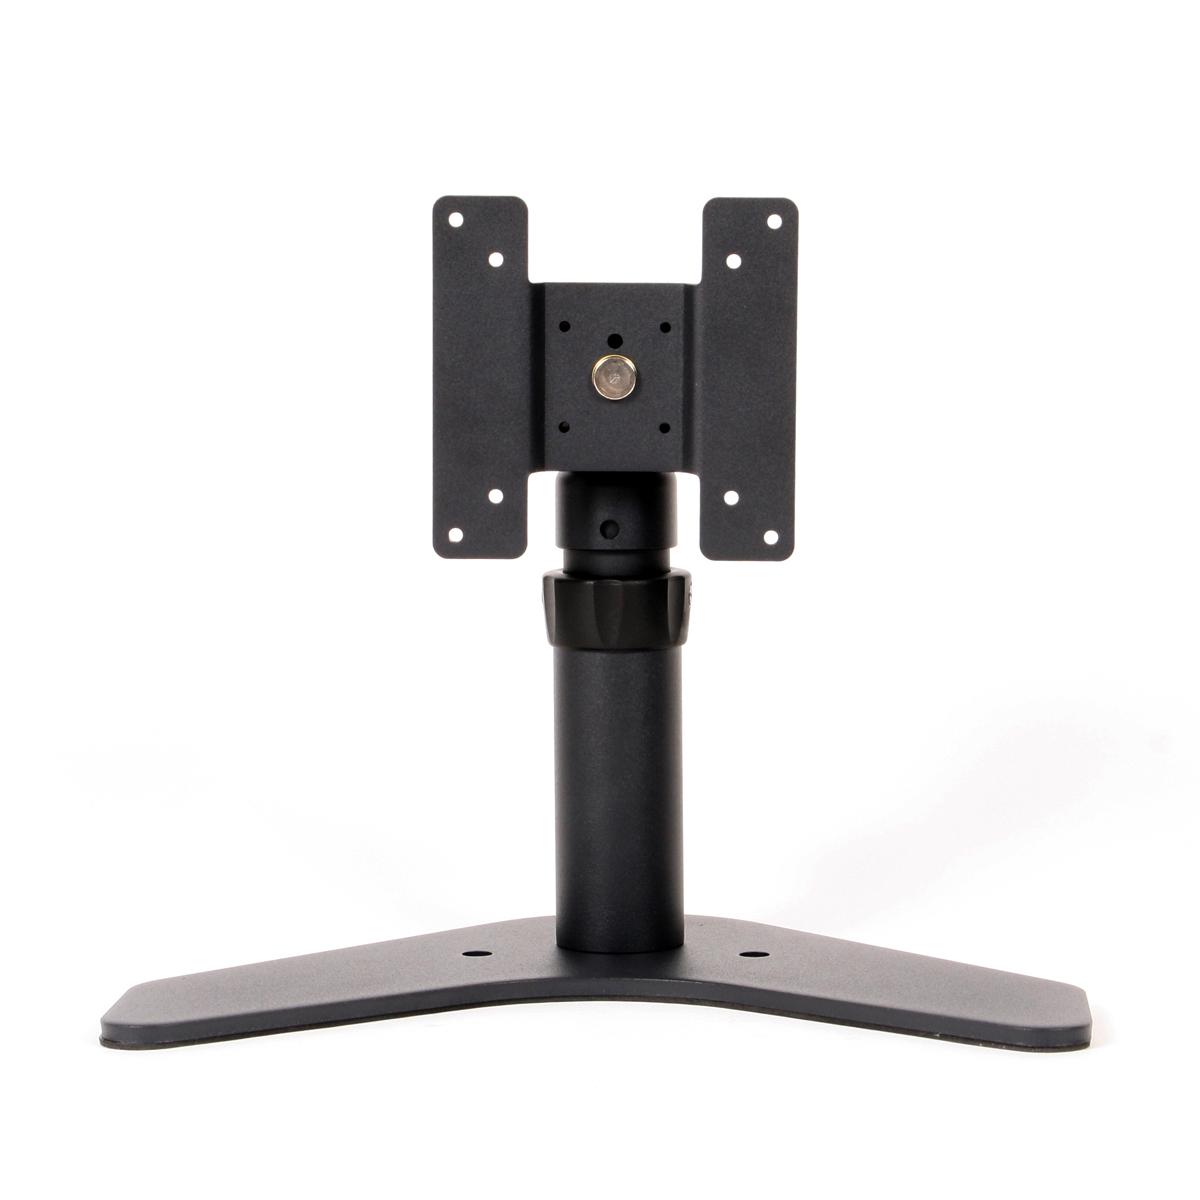 LCDモニタースタンド モニターアーム\スタンド式